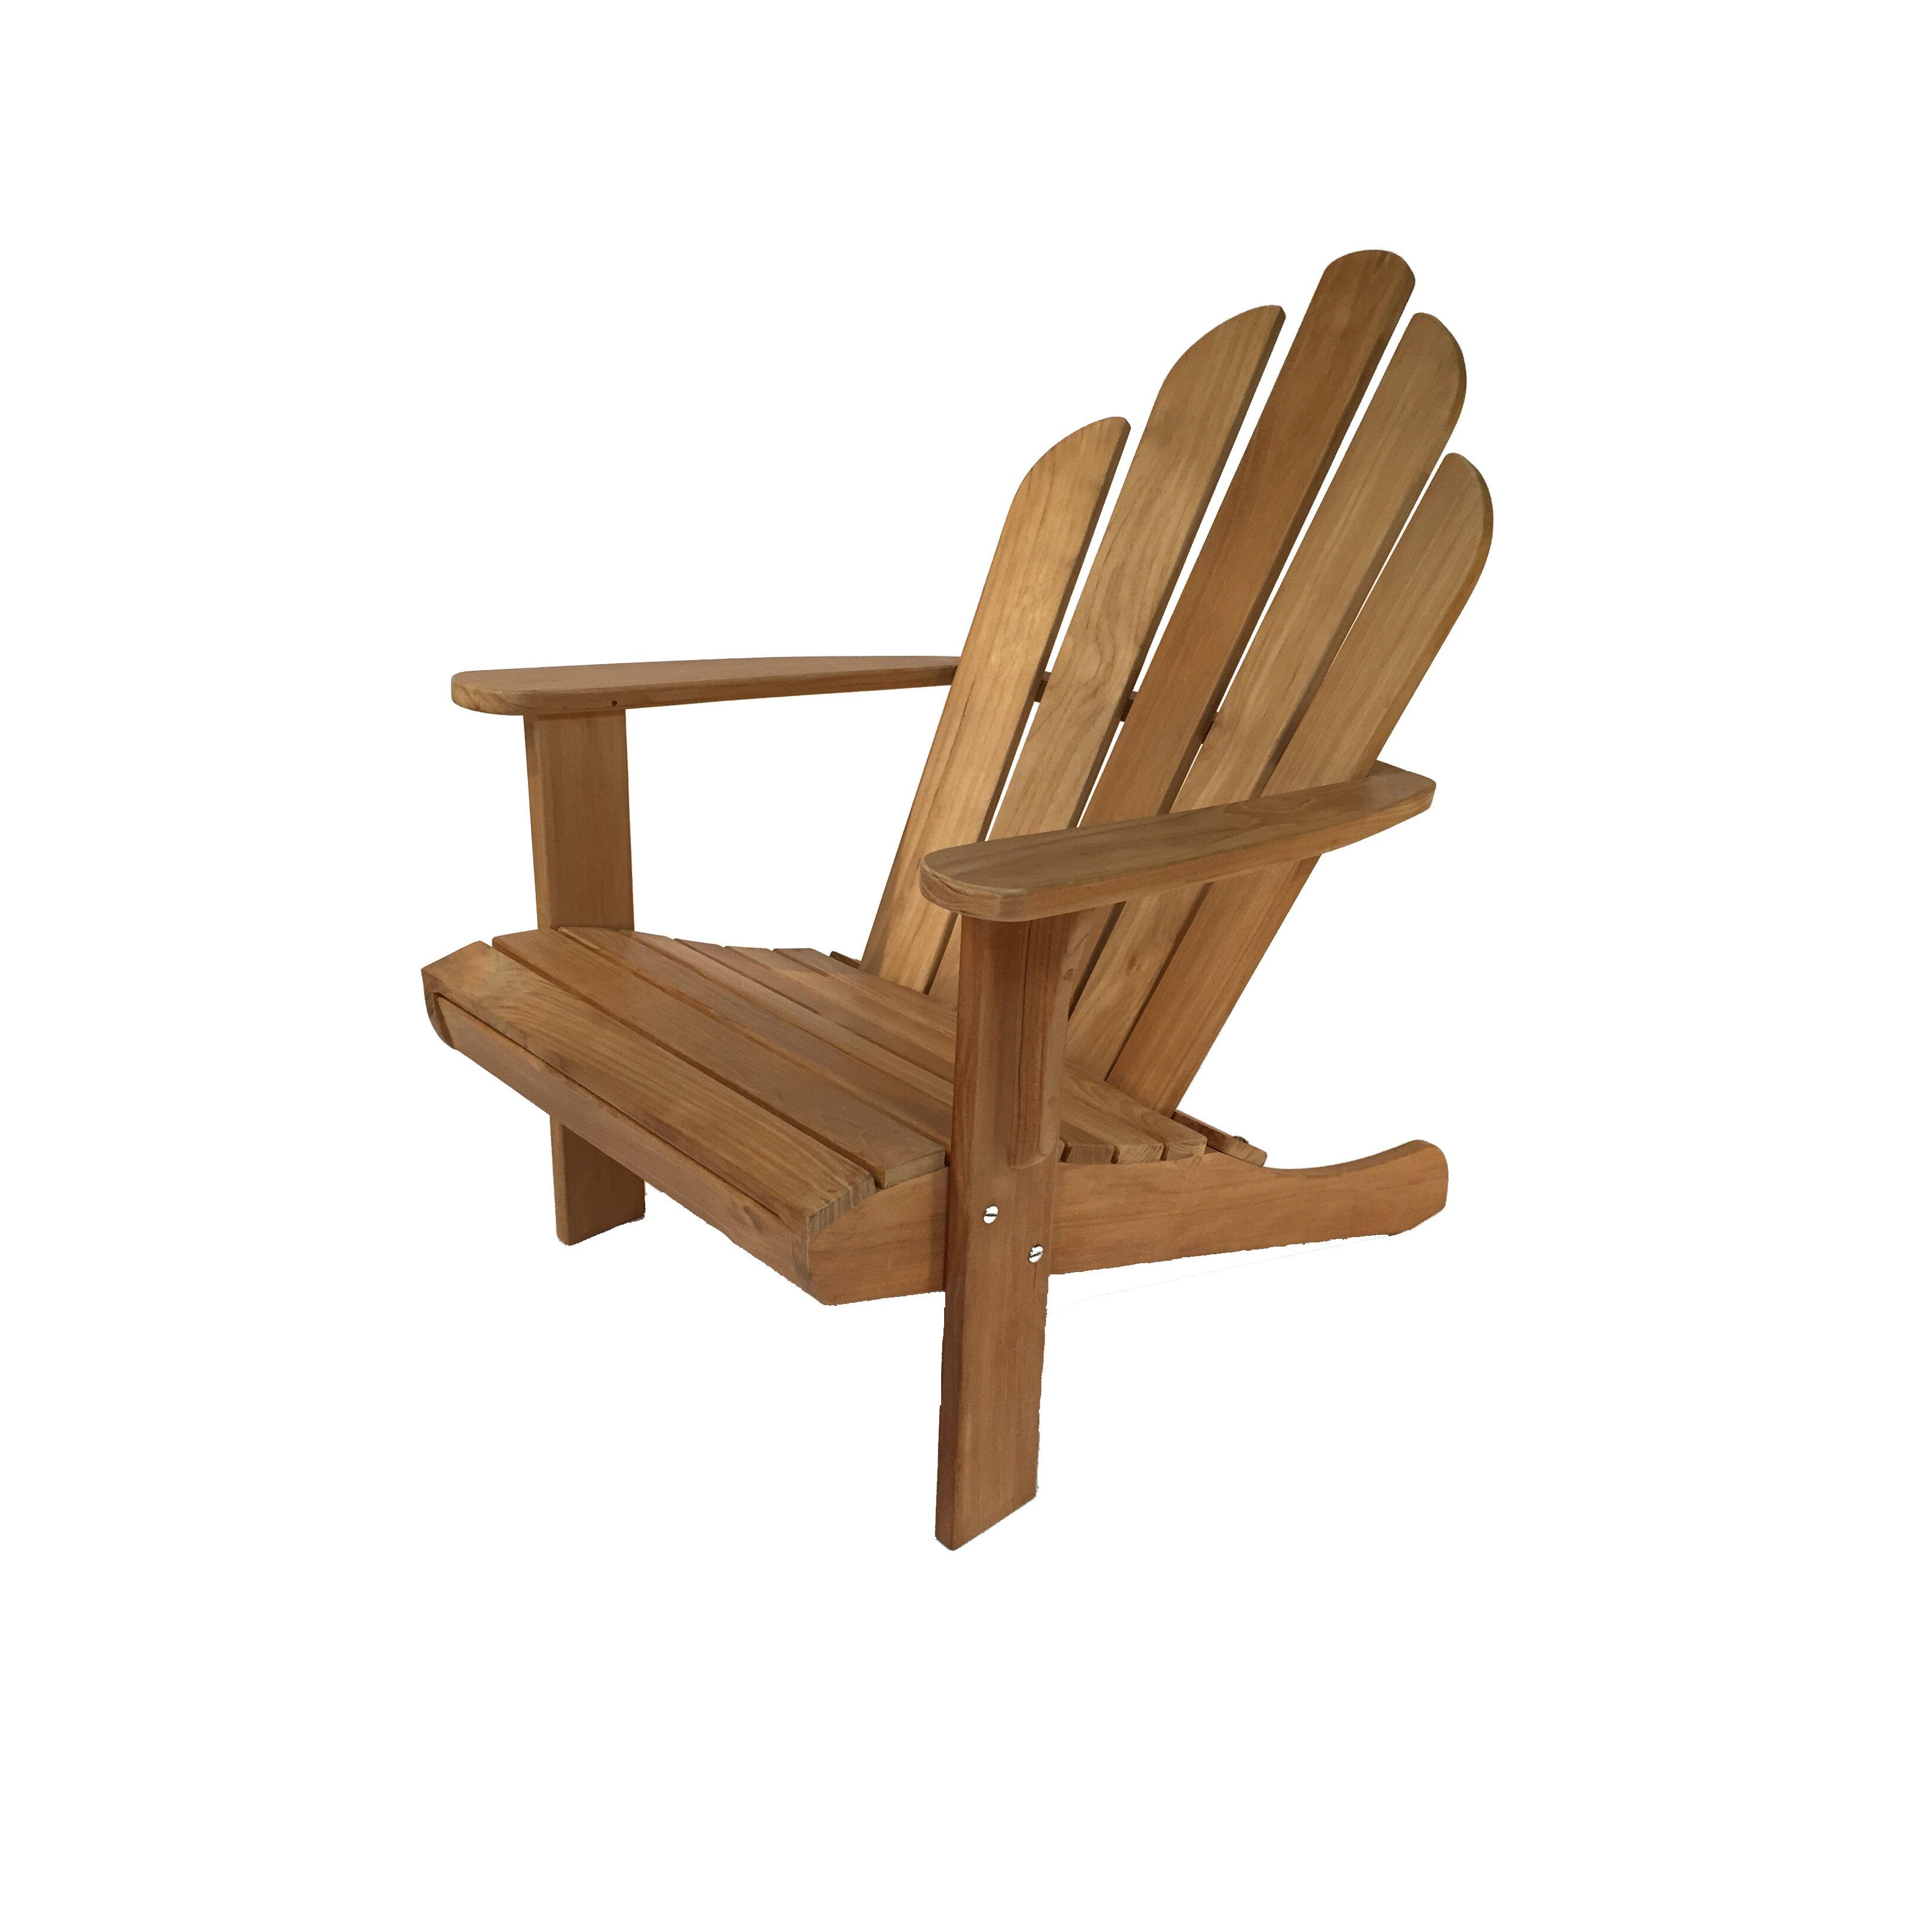 Co9 design adirondack chair wayfair for Adirondack chairs design